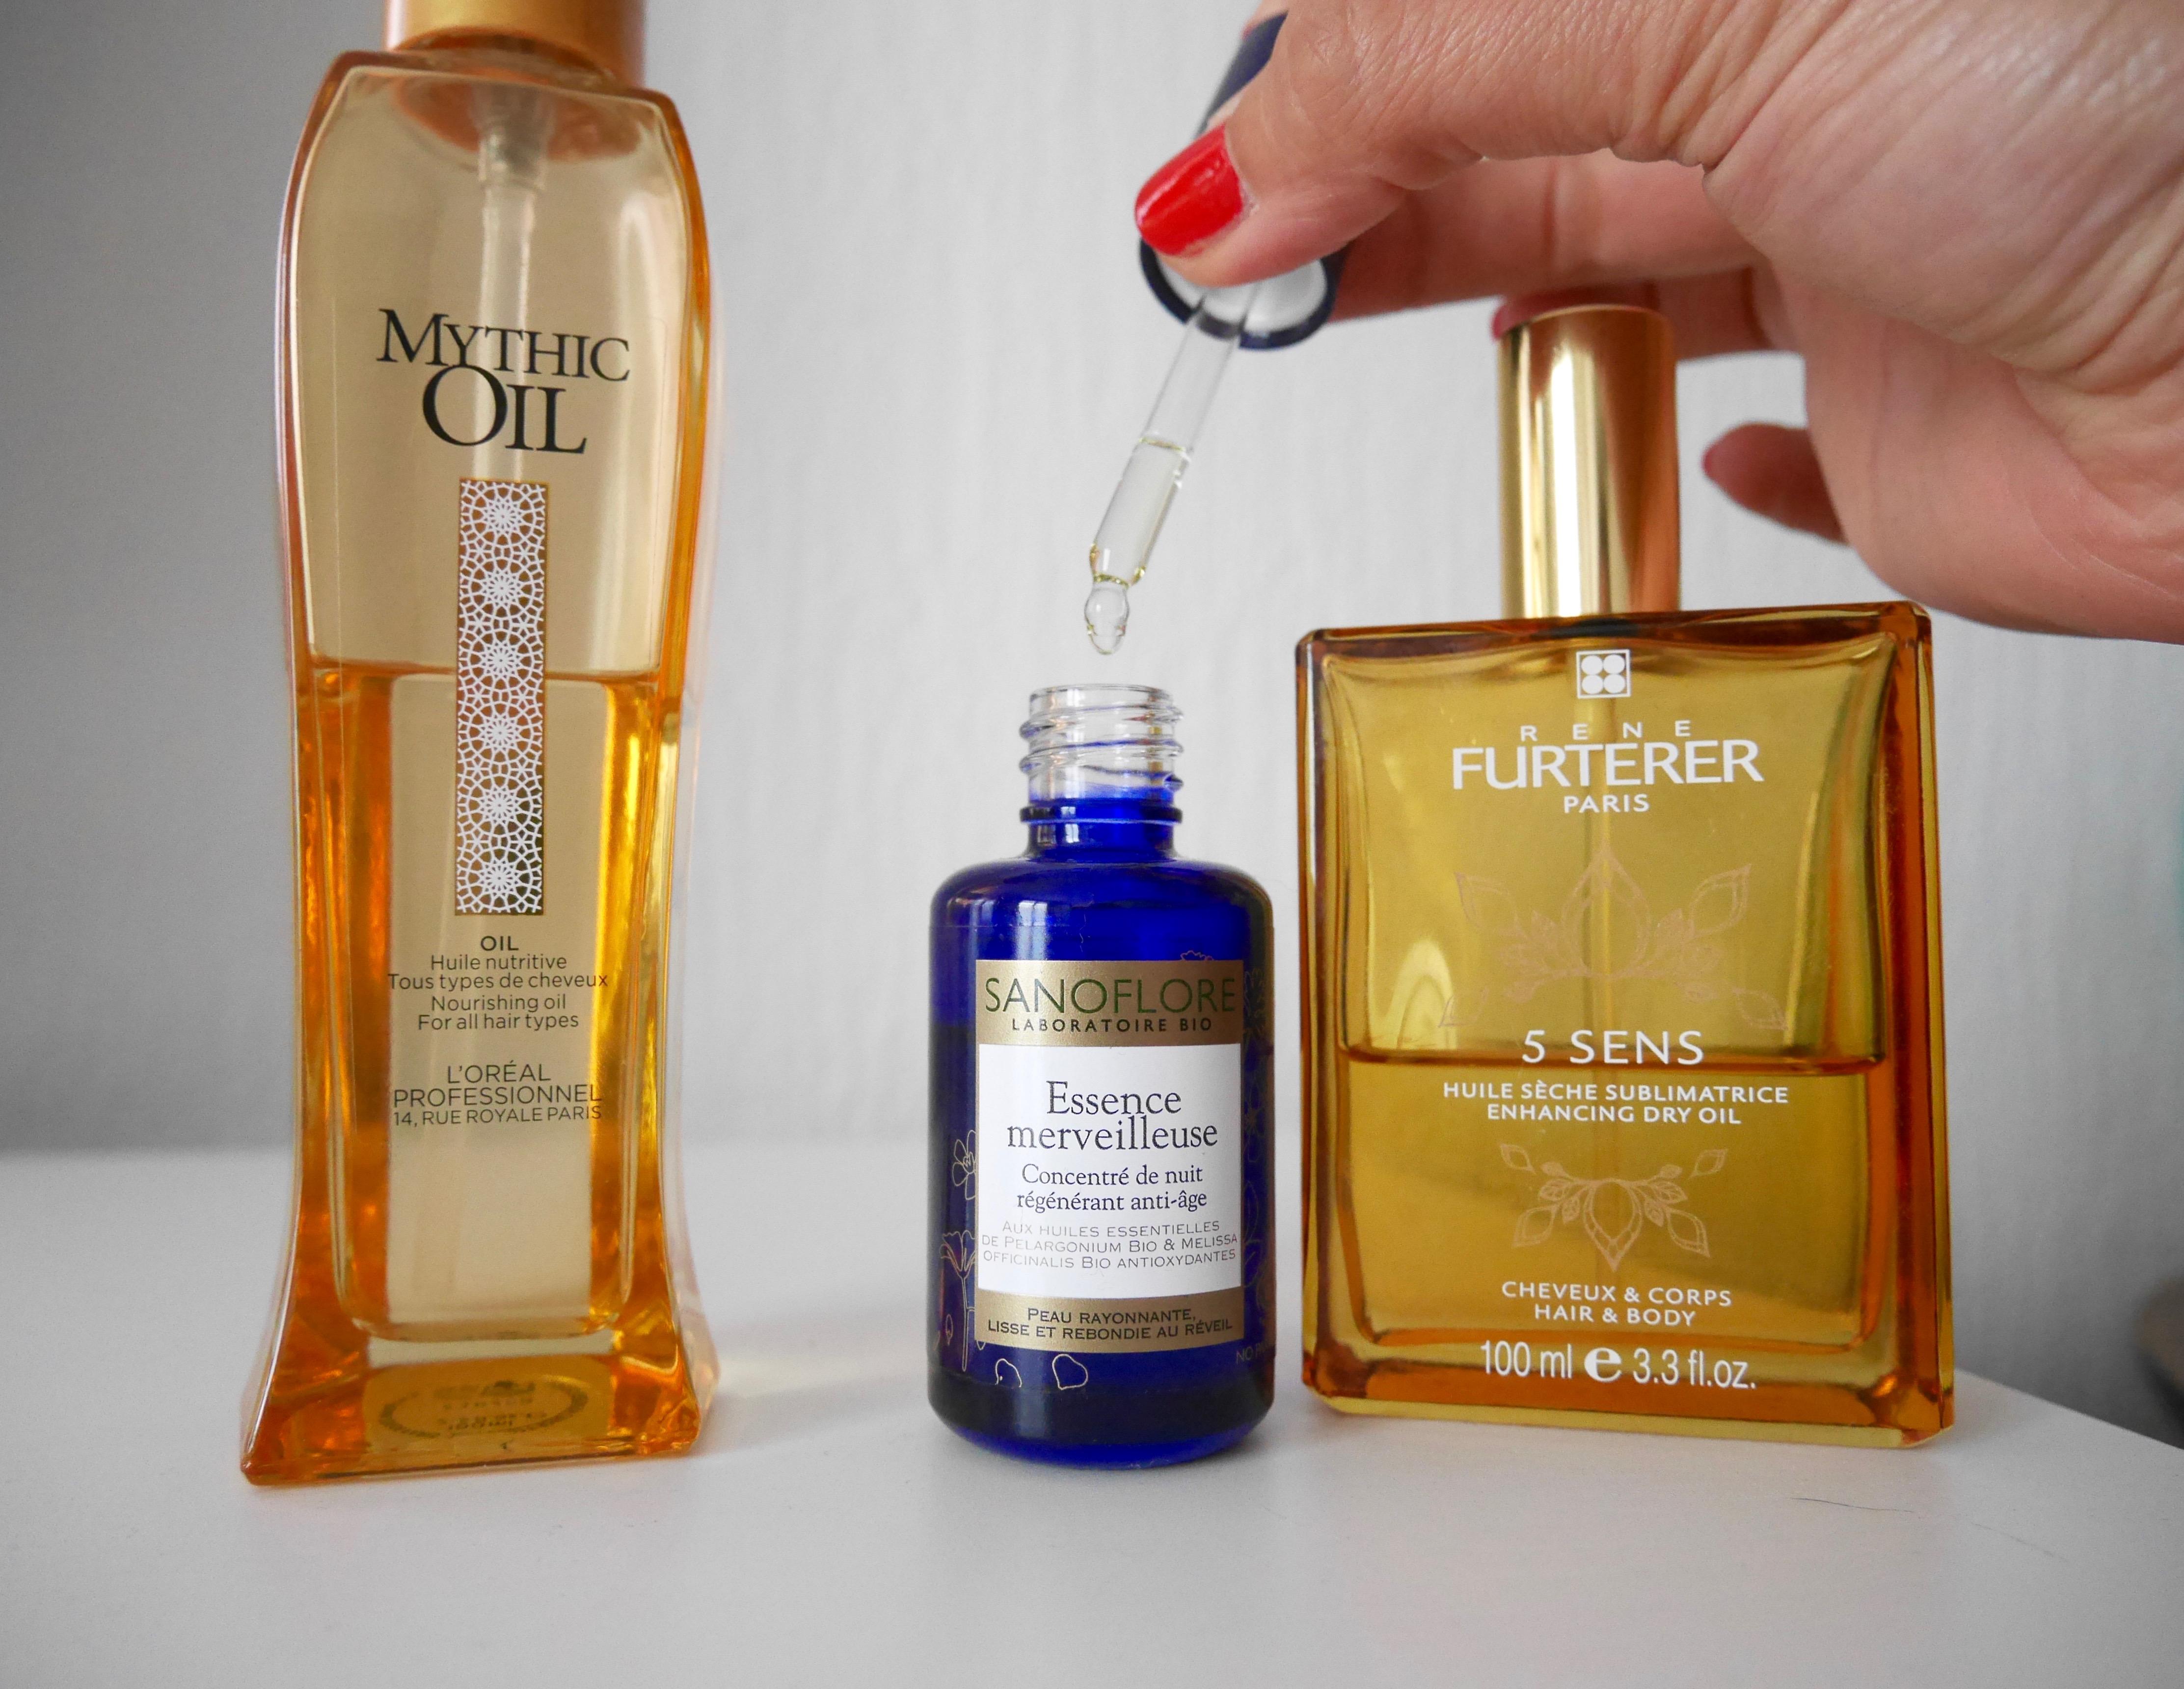 mythic oil huile 5 sens